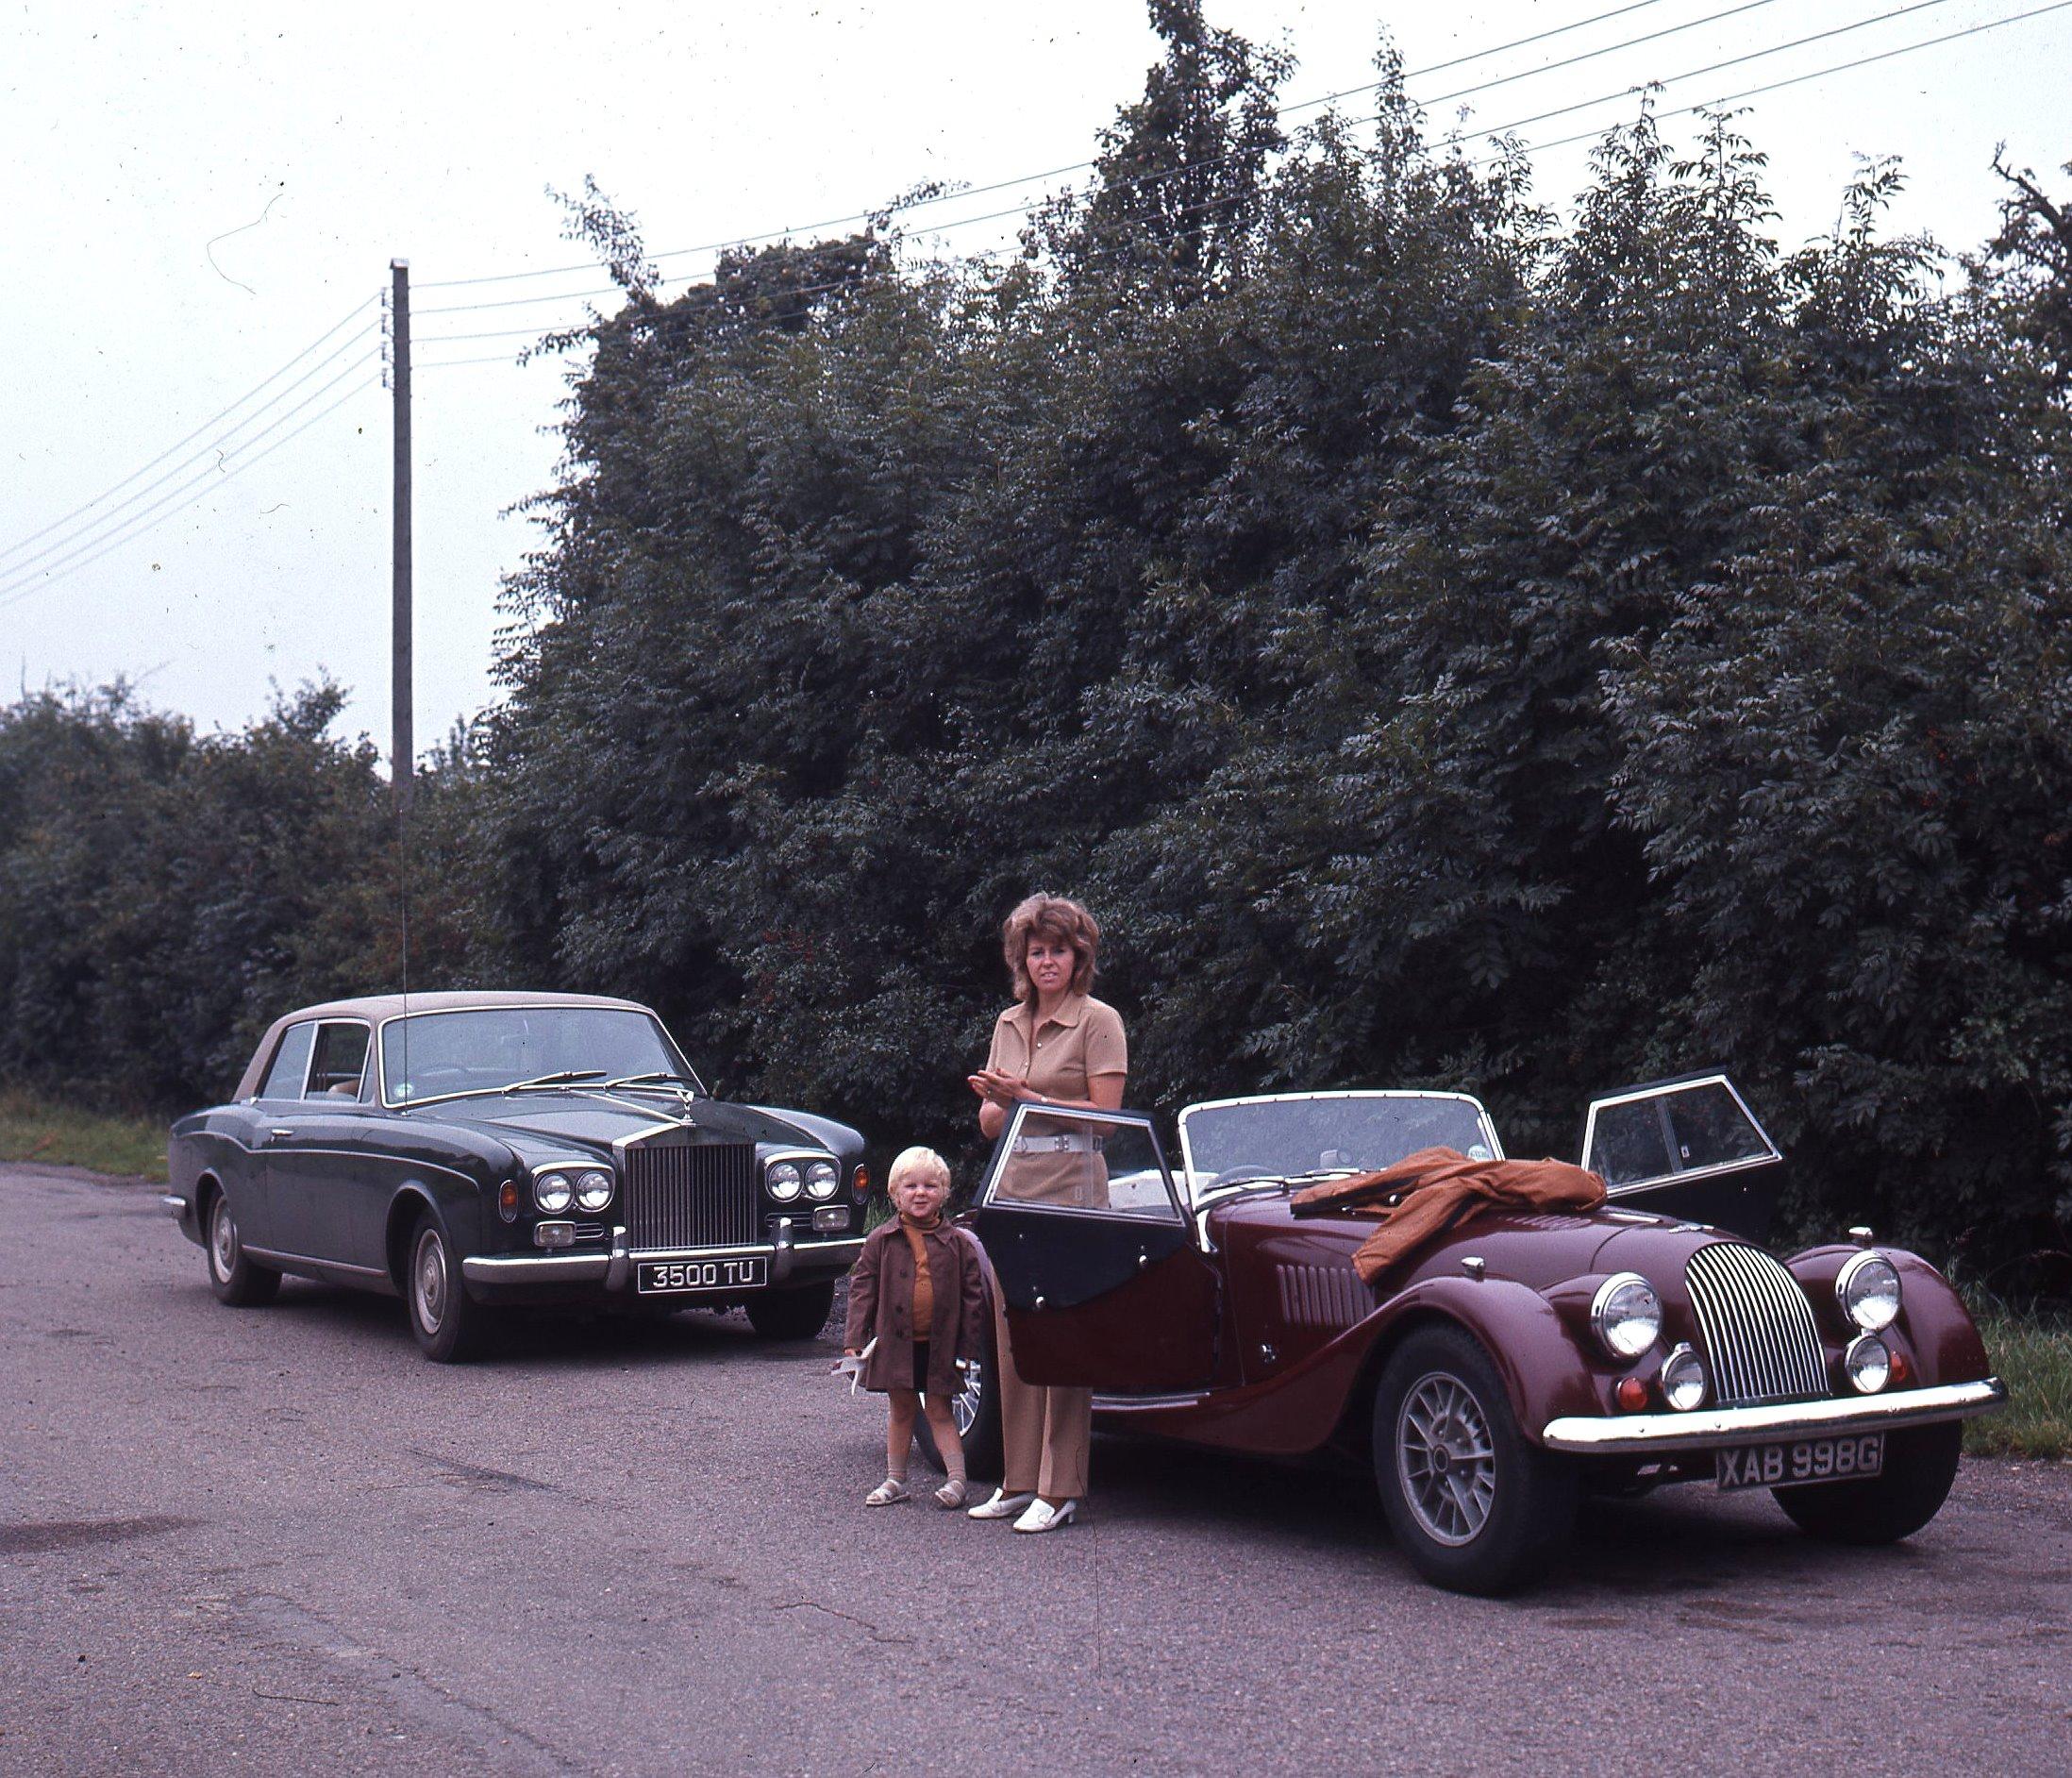 001 Morgan and RR 2 door Mulliner 25 Aug 1970.jpg